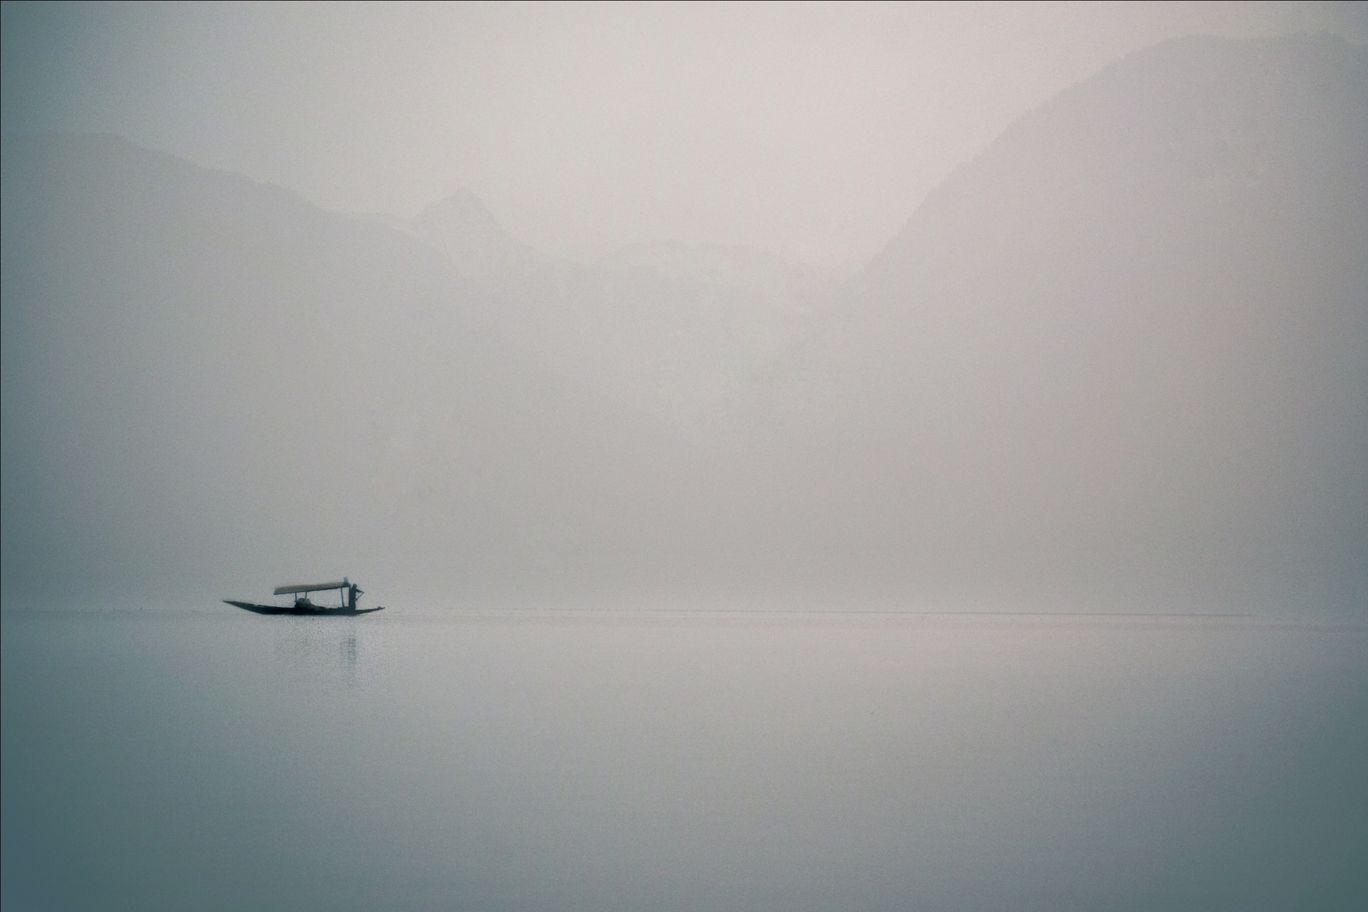 Photo of Dal Lake By Yash Bhadauria